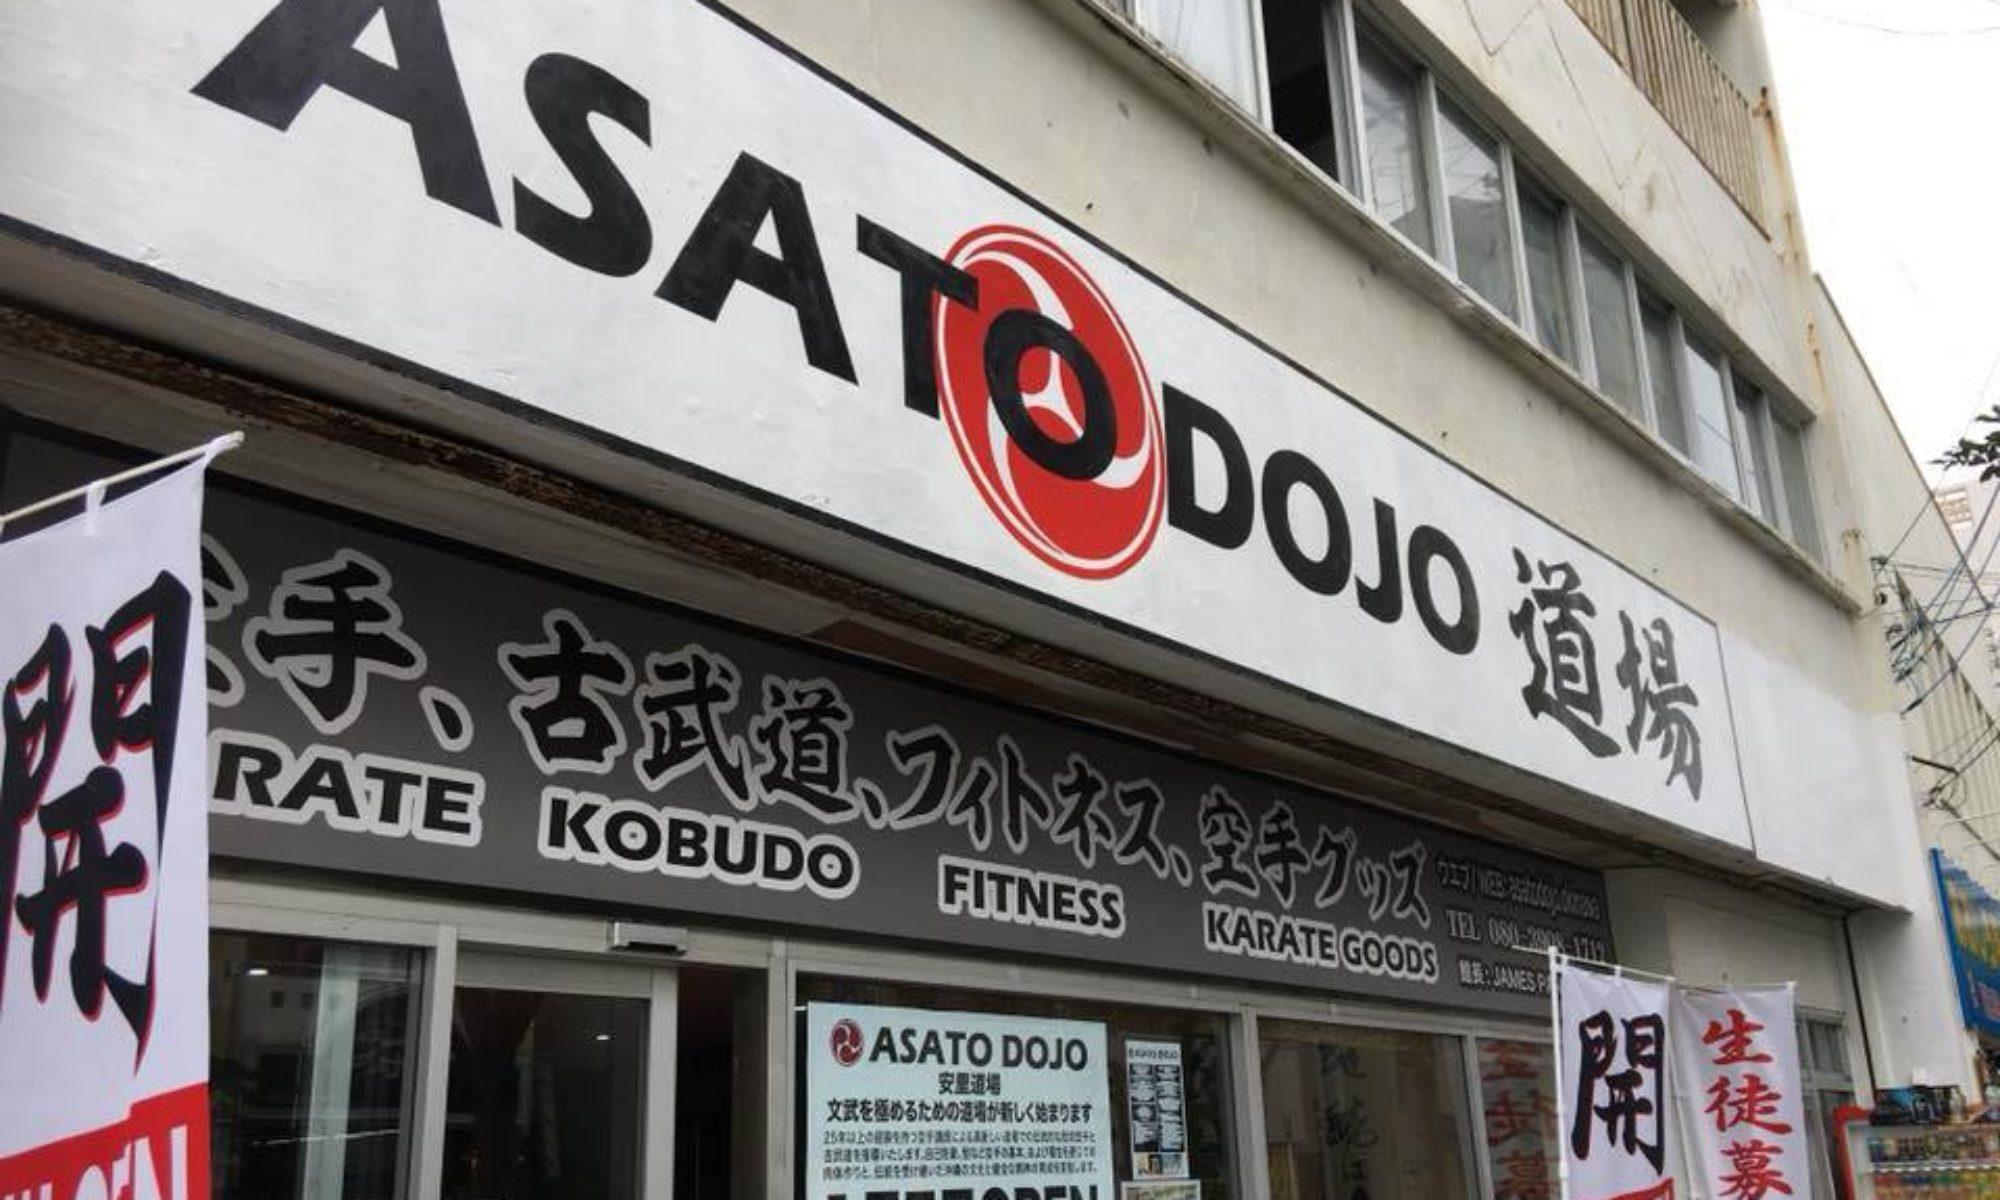 Asato Dojo Okinawa